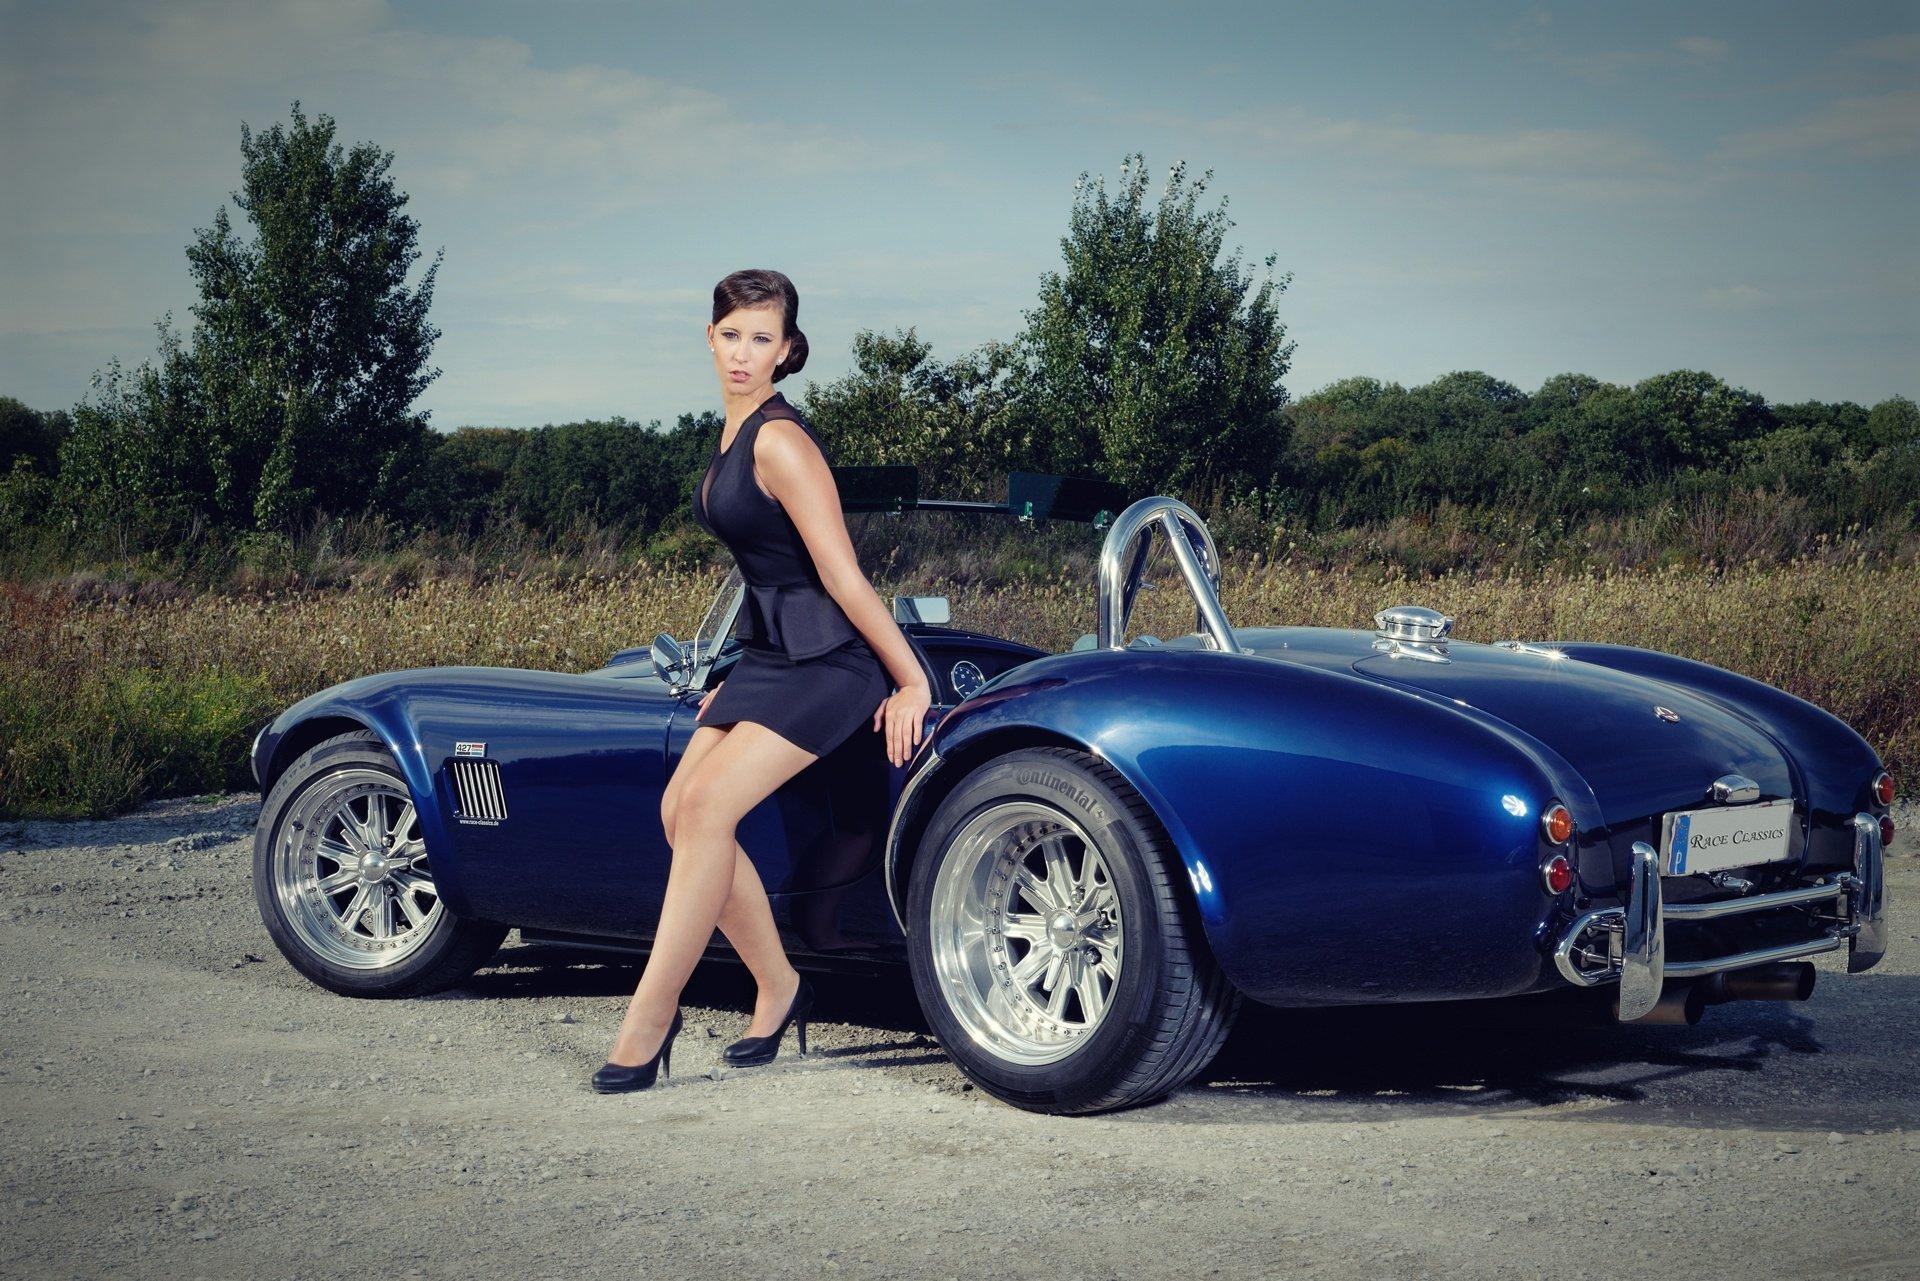 Красивые девушки и автомобили